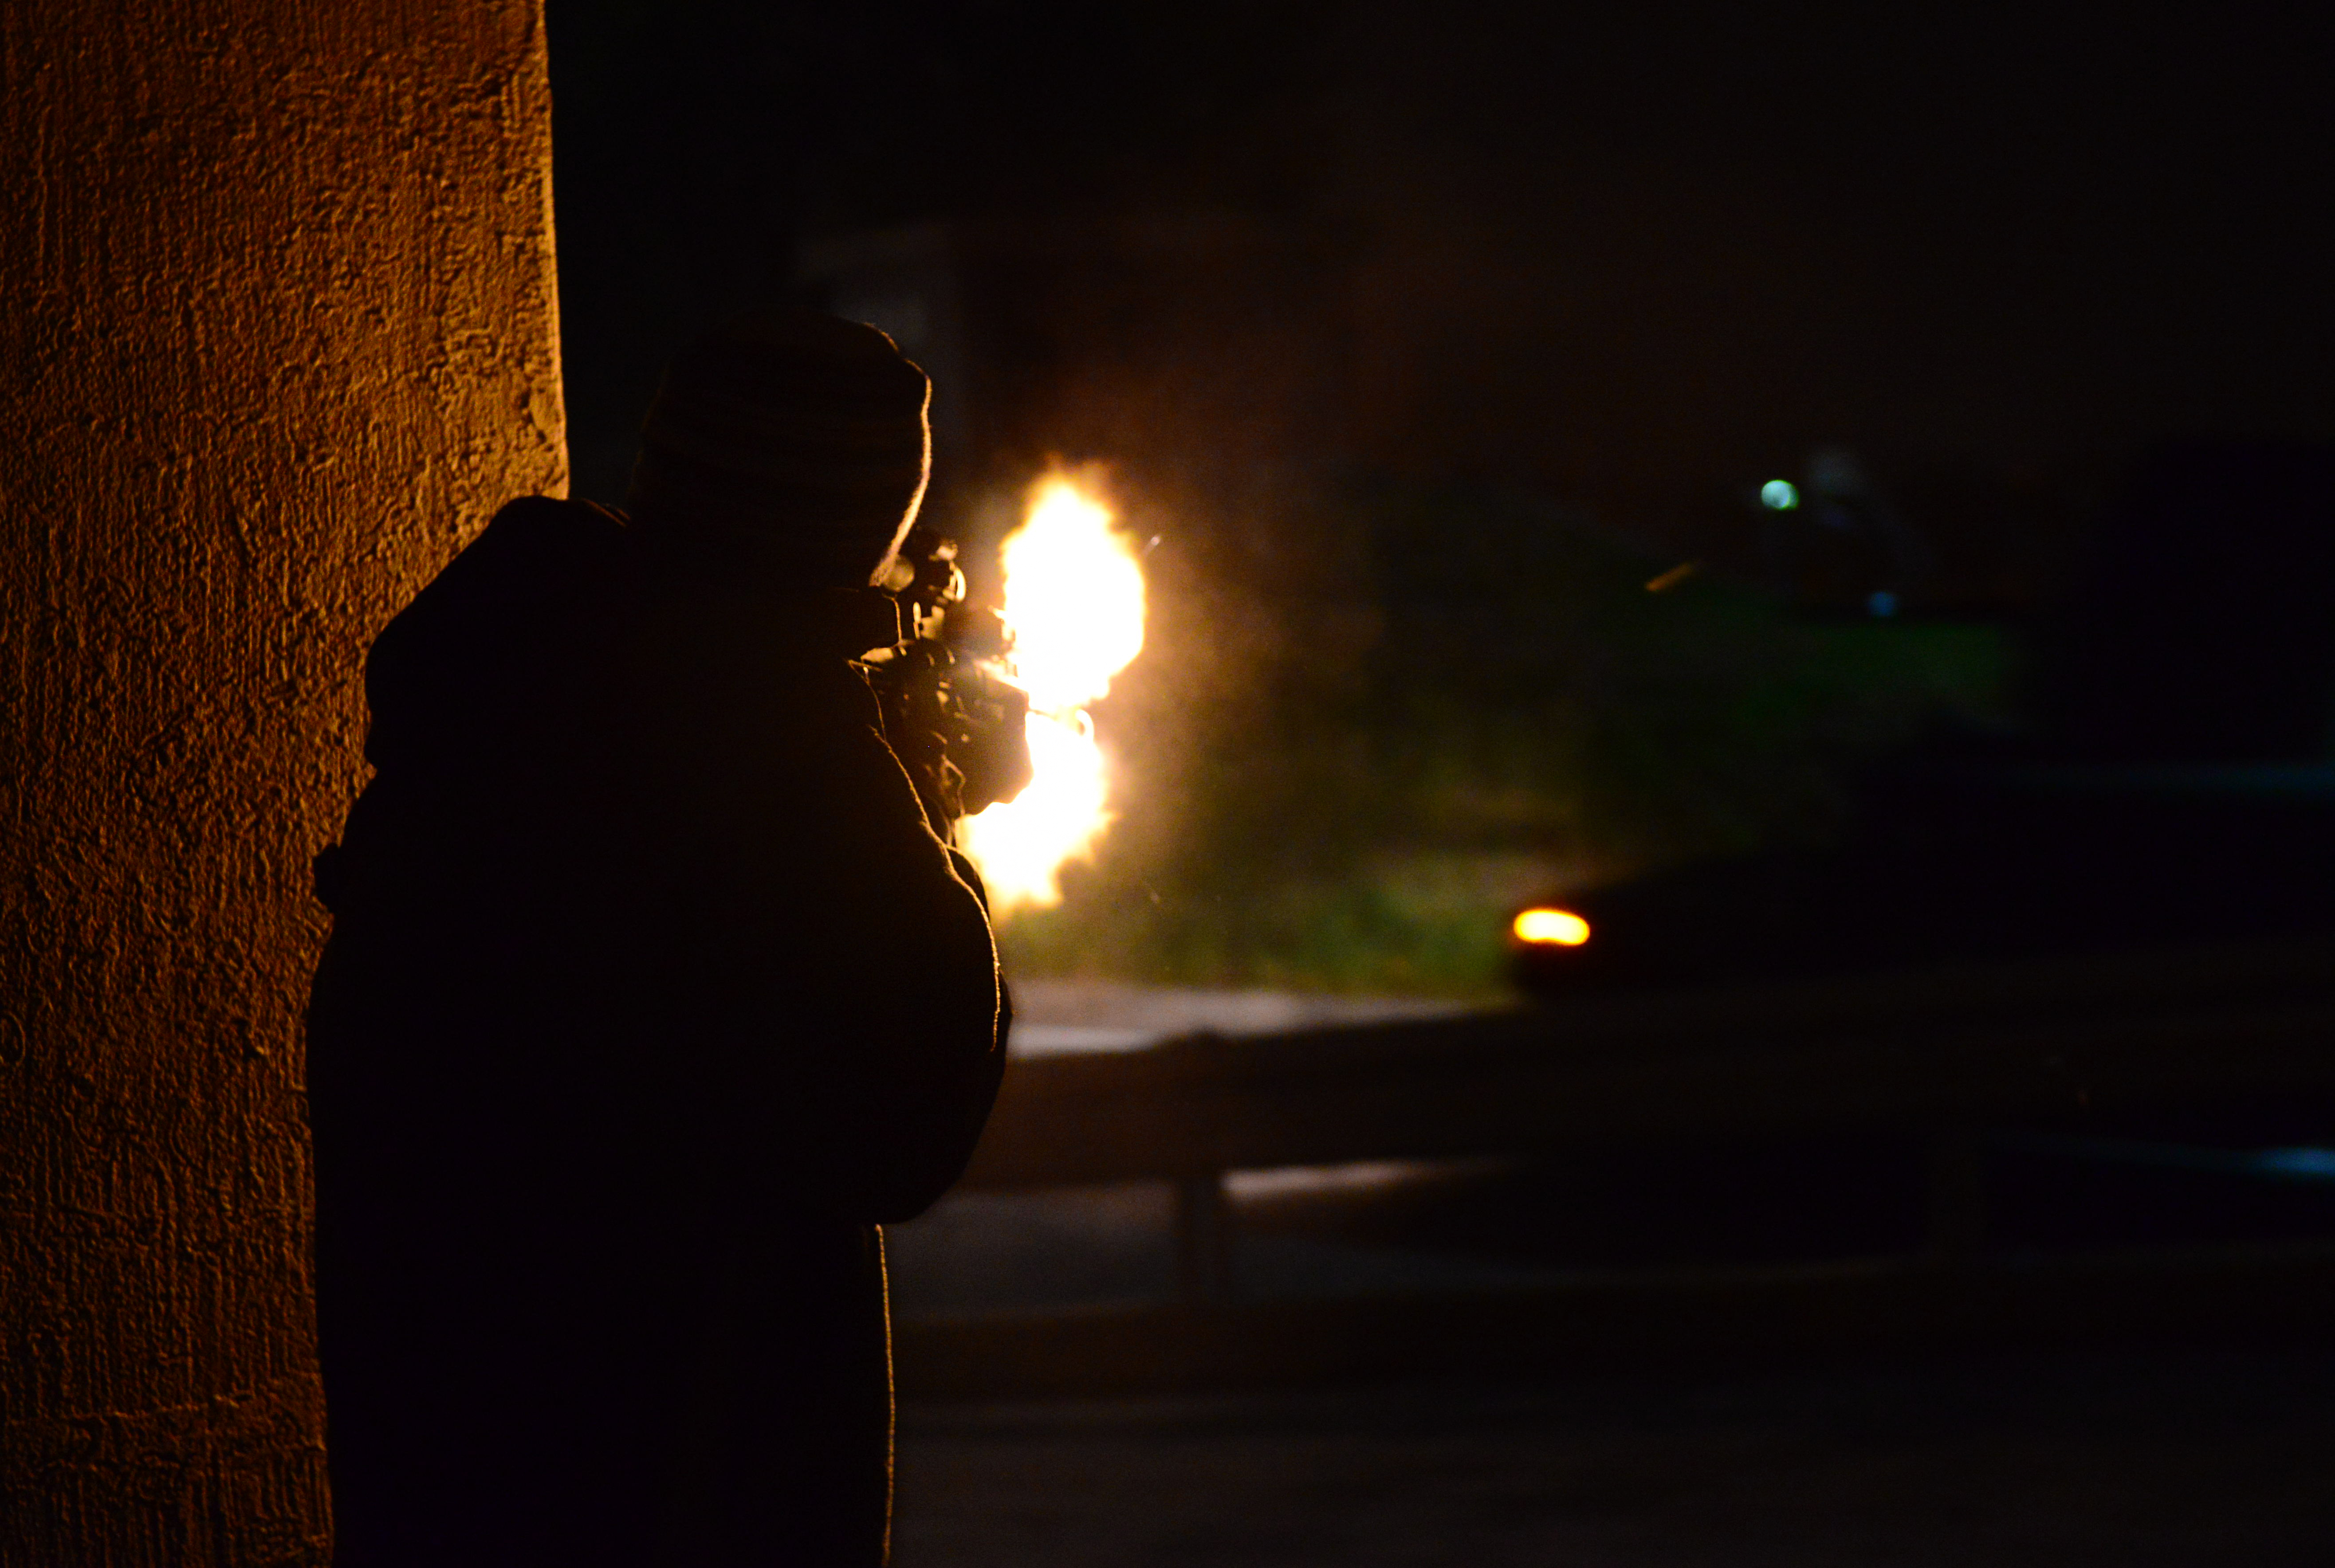 vigilant ace 16 mwds handlers